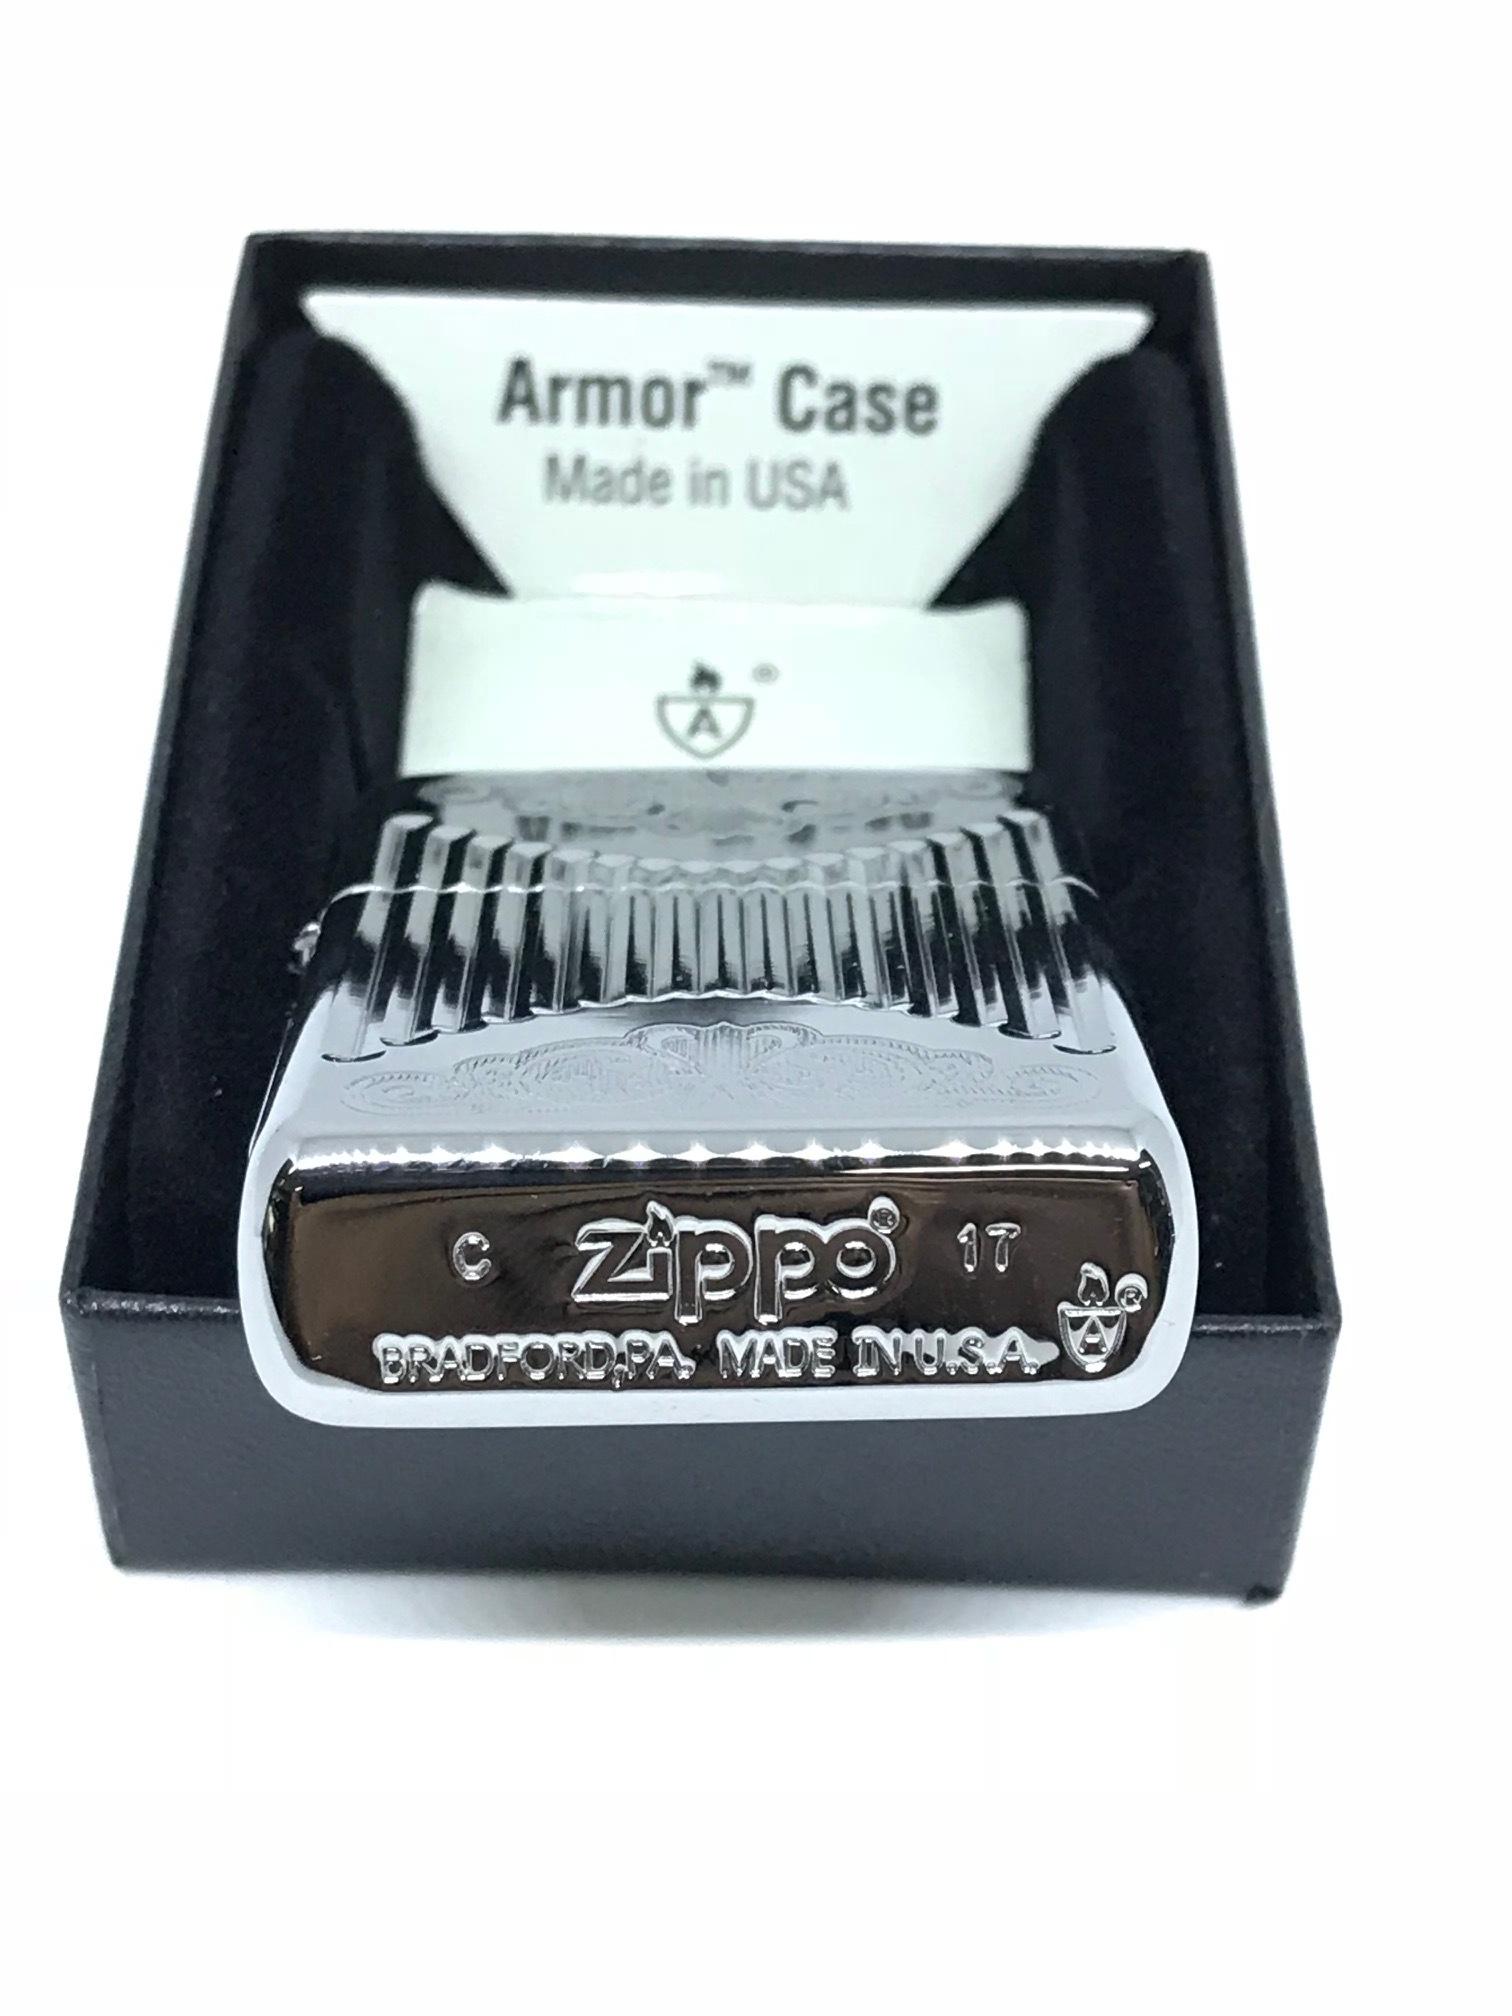 Zippo Armor Regal ntz565 3